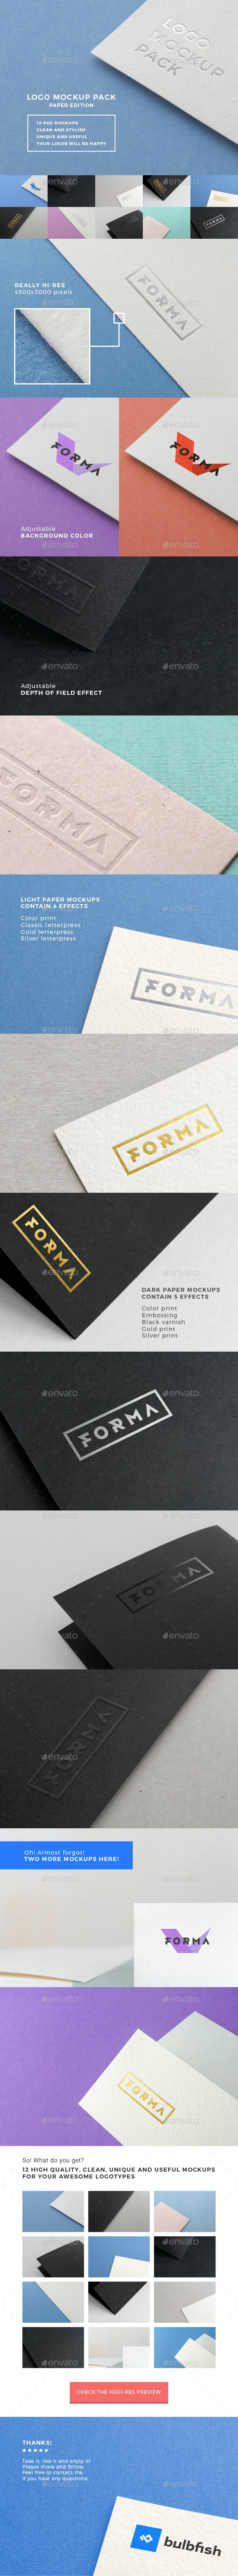 Logo Mockup Pack. Paper Edition - Logo Product Mock-Ups